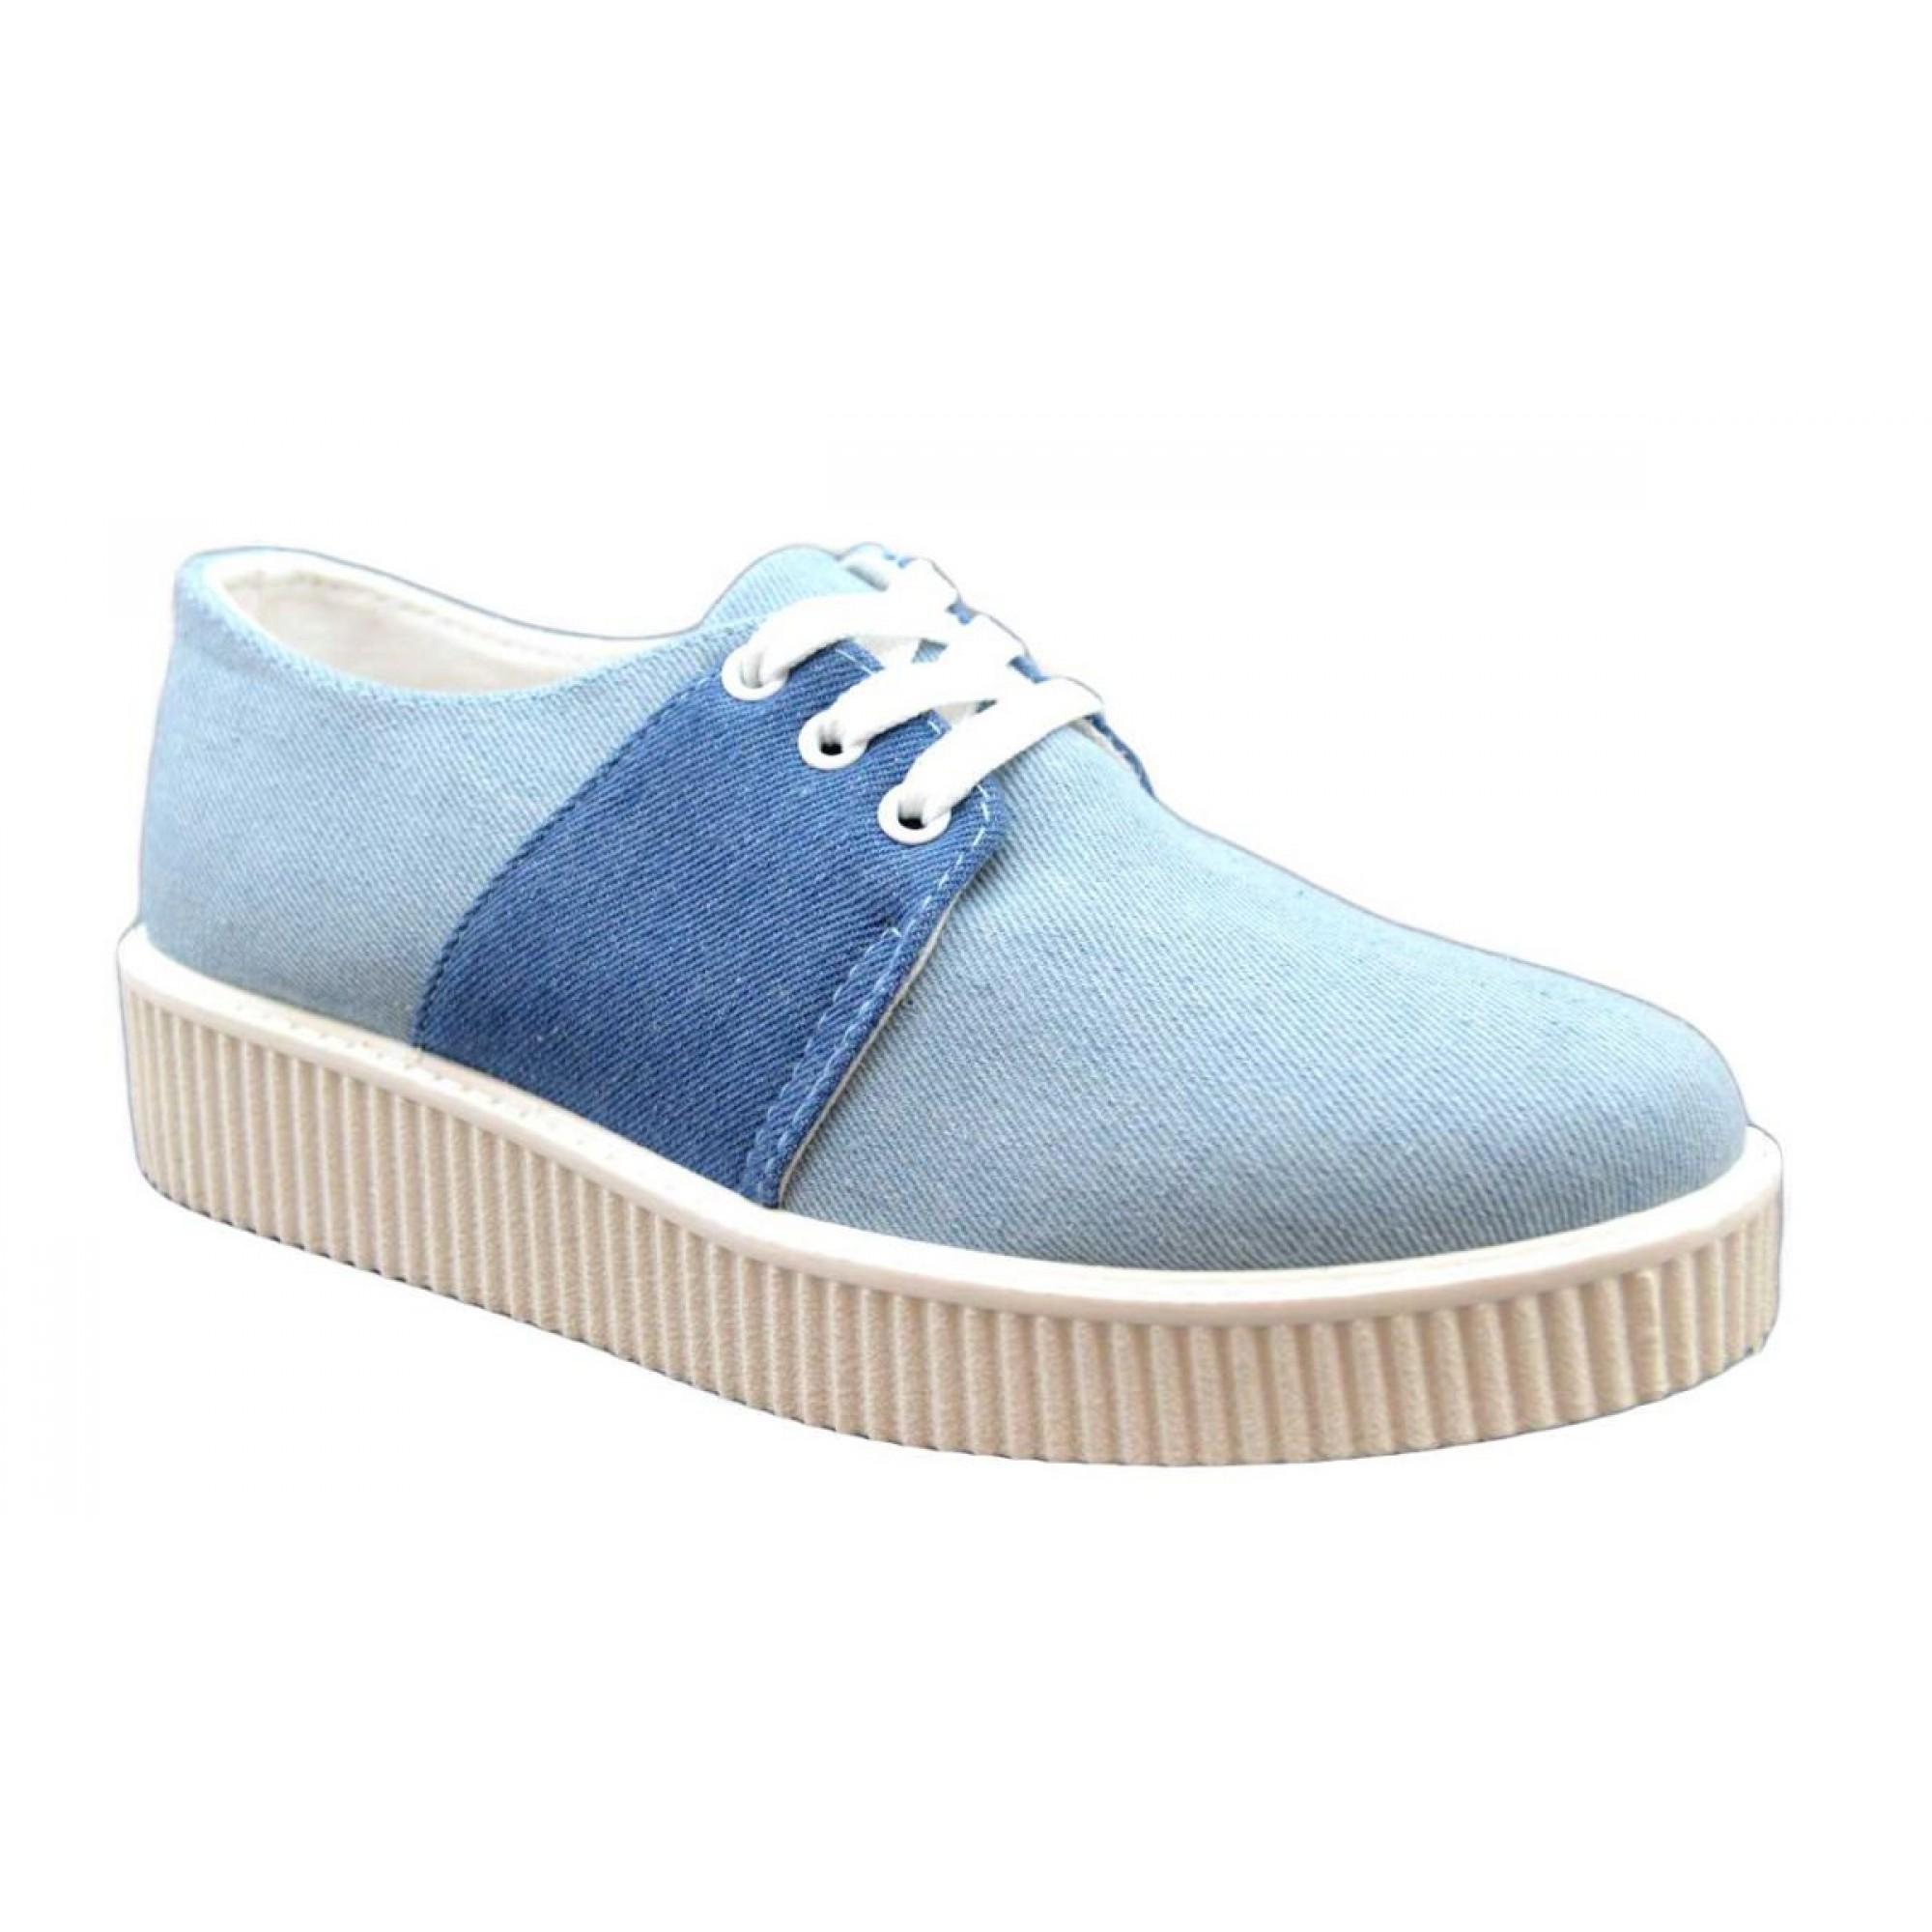 pantofi sport dama albastri cu talpa groasa. Black Bedroom Furniture Sets. Home Design Ideas